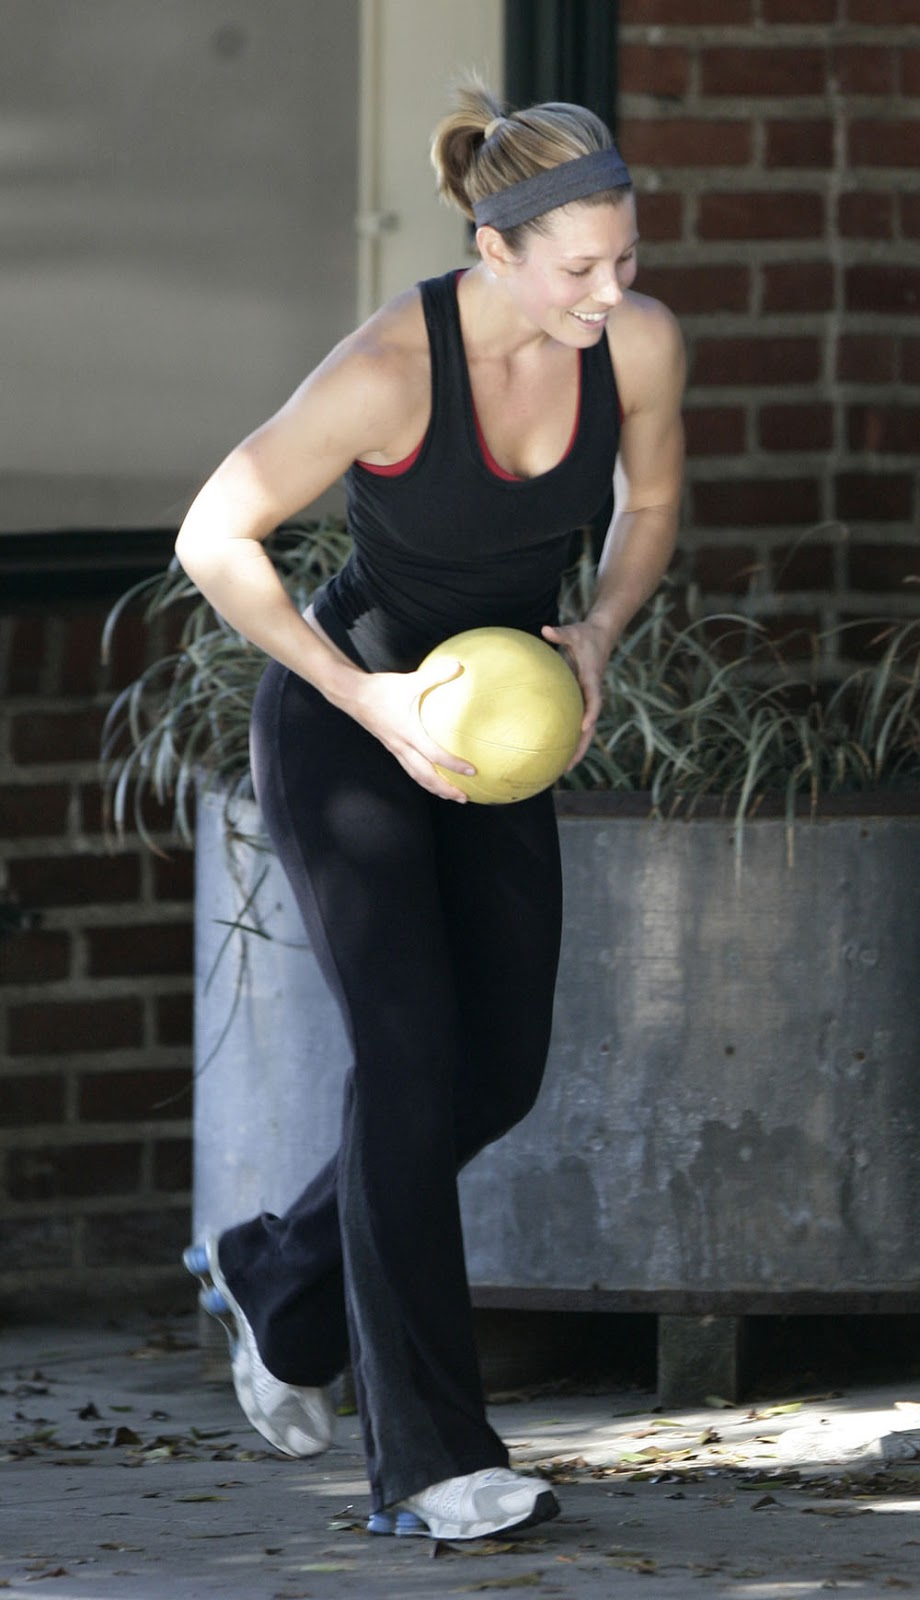 Jessica Biel Workout and Diet Secret | Muscle world Jessica Biel Workout